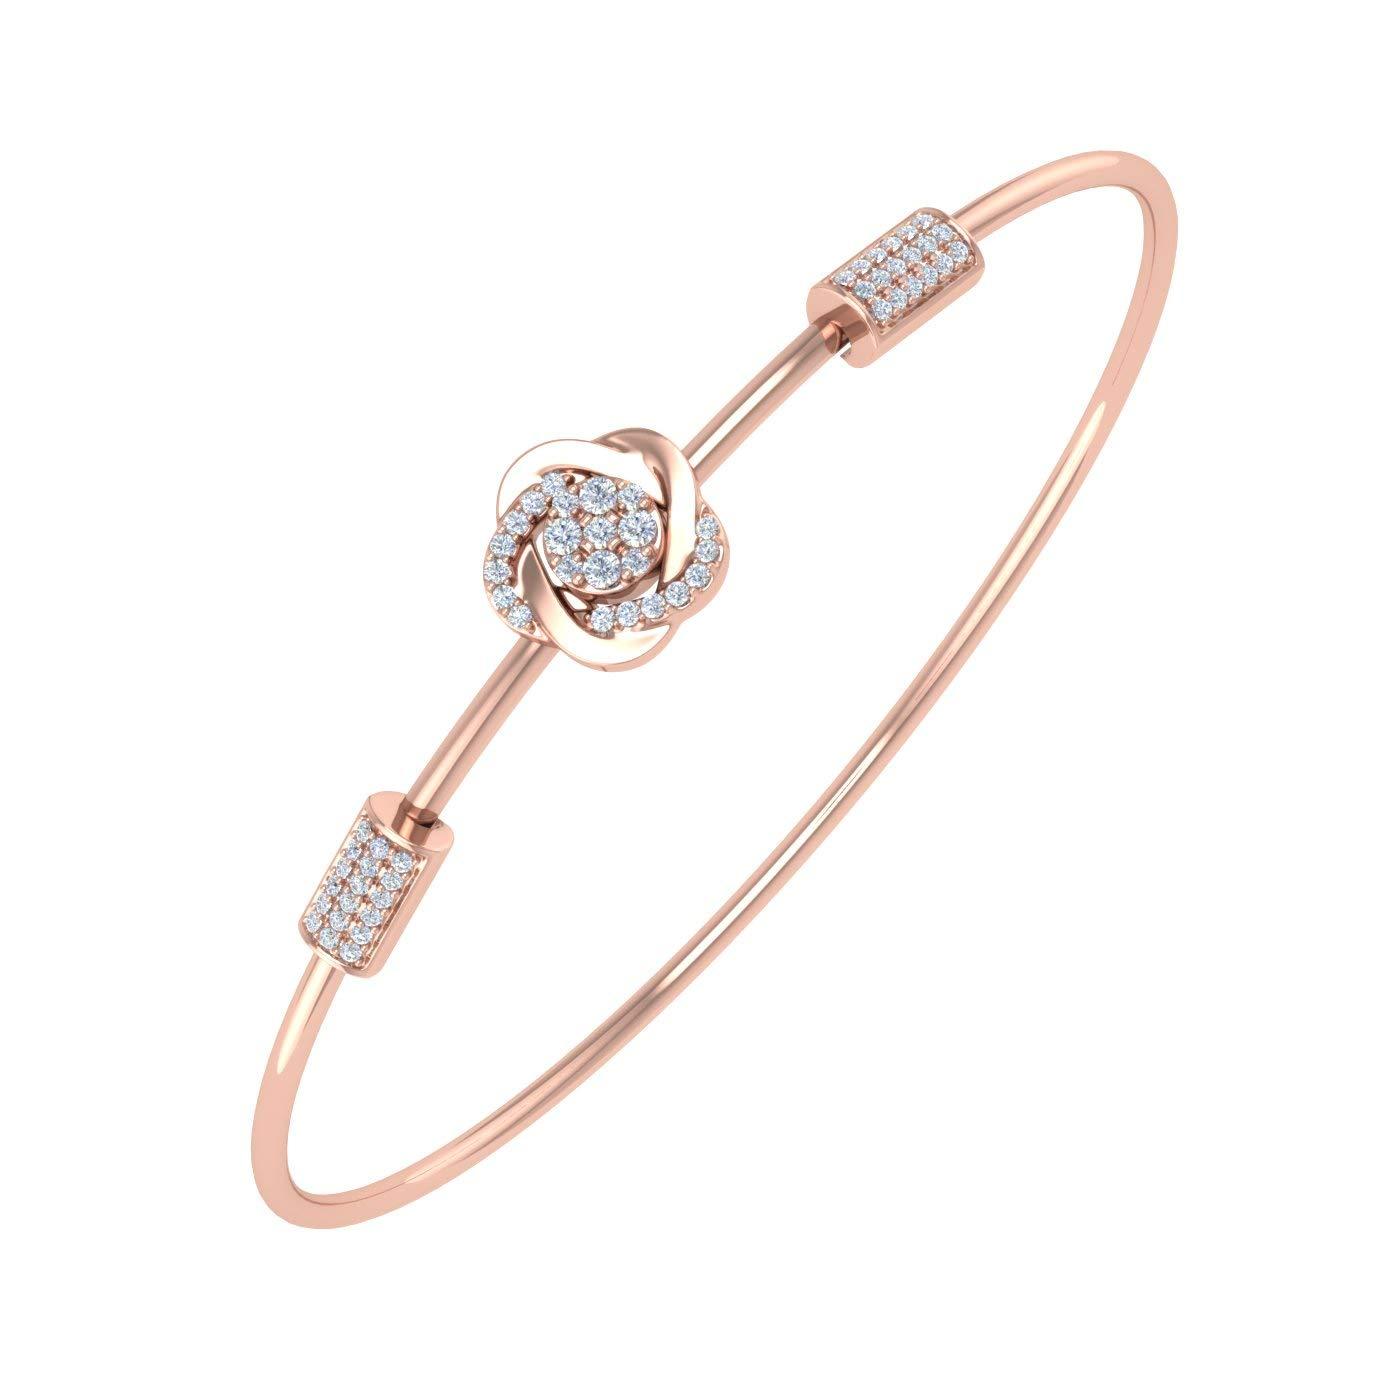 1/5 Carat Diamond Floral Bangle Bracelet in 10K Gold and Steel